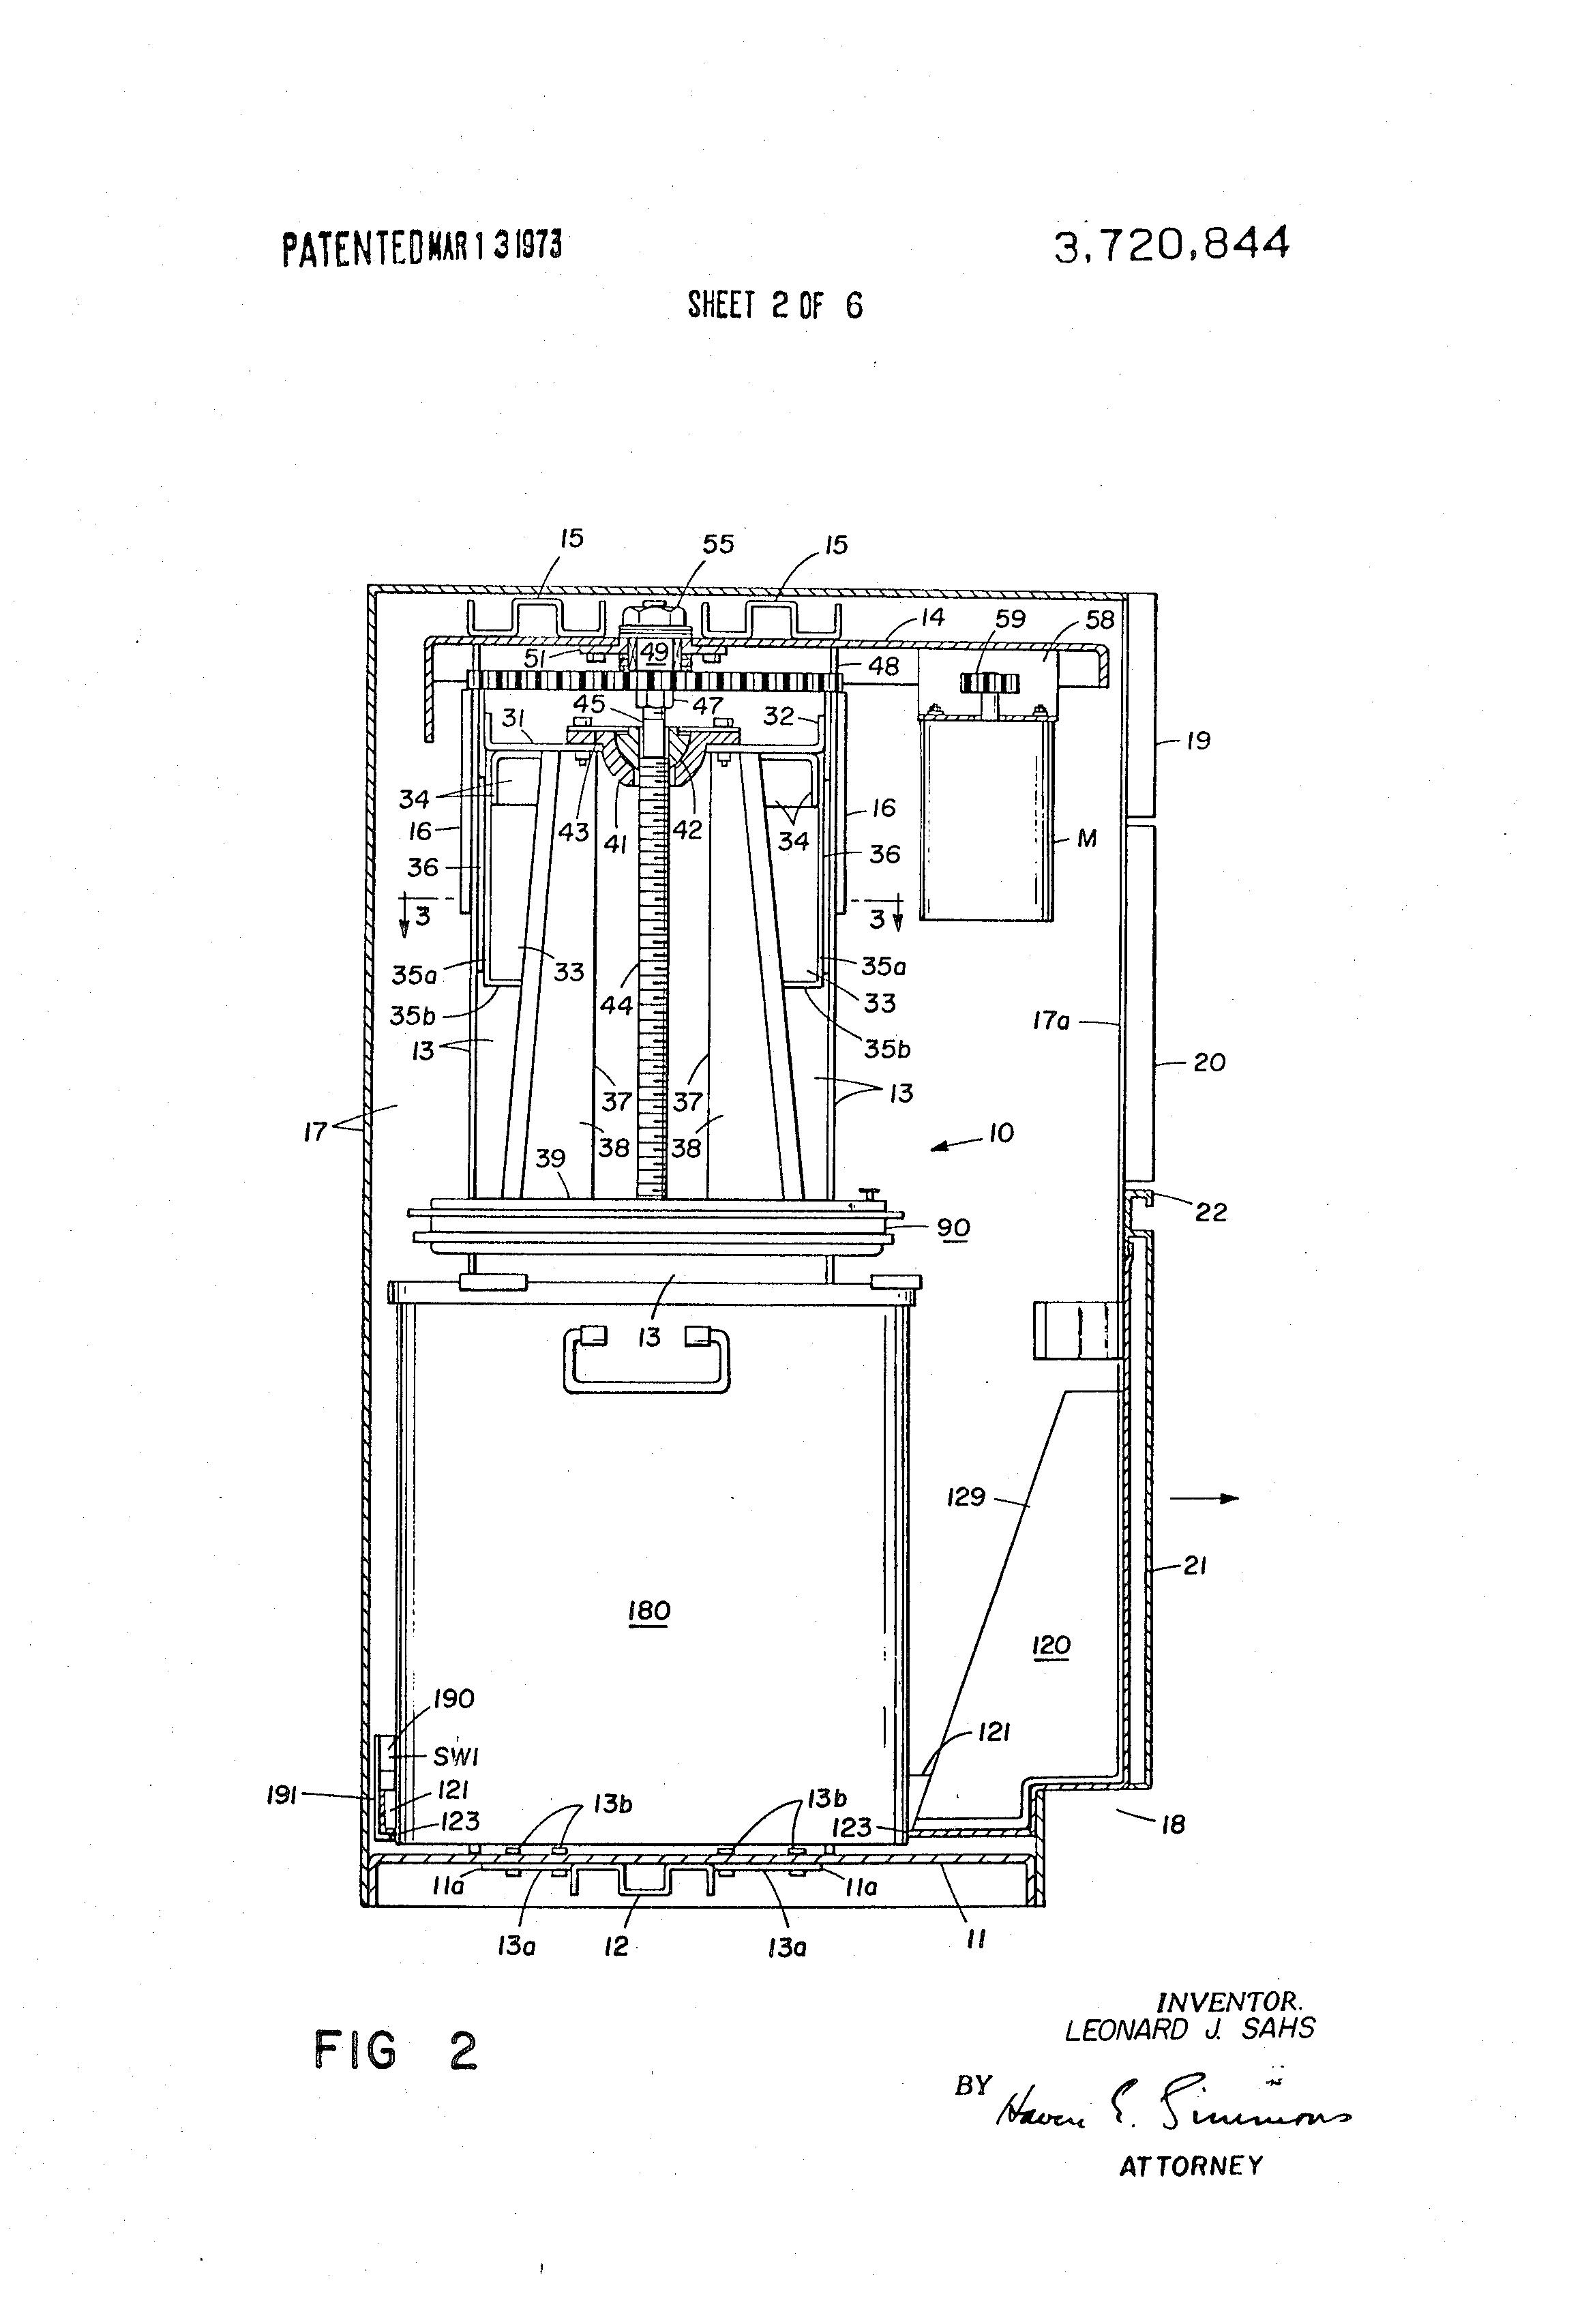 sears trash compactor wiring diagram 6 12 depo aqua de u2022 rh 6 12 depo aqua de hydraulic trash compactor wiring diagram kitchenaid trash compactor wiring diagram